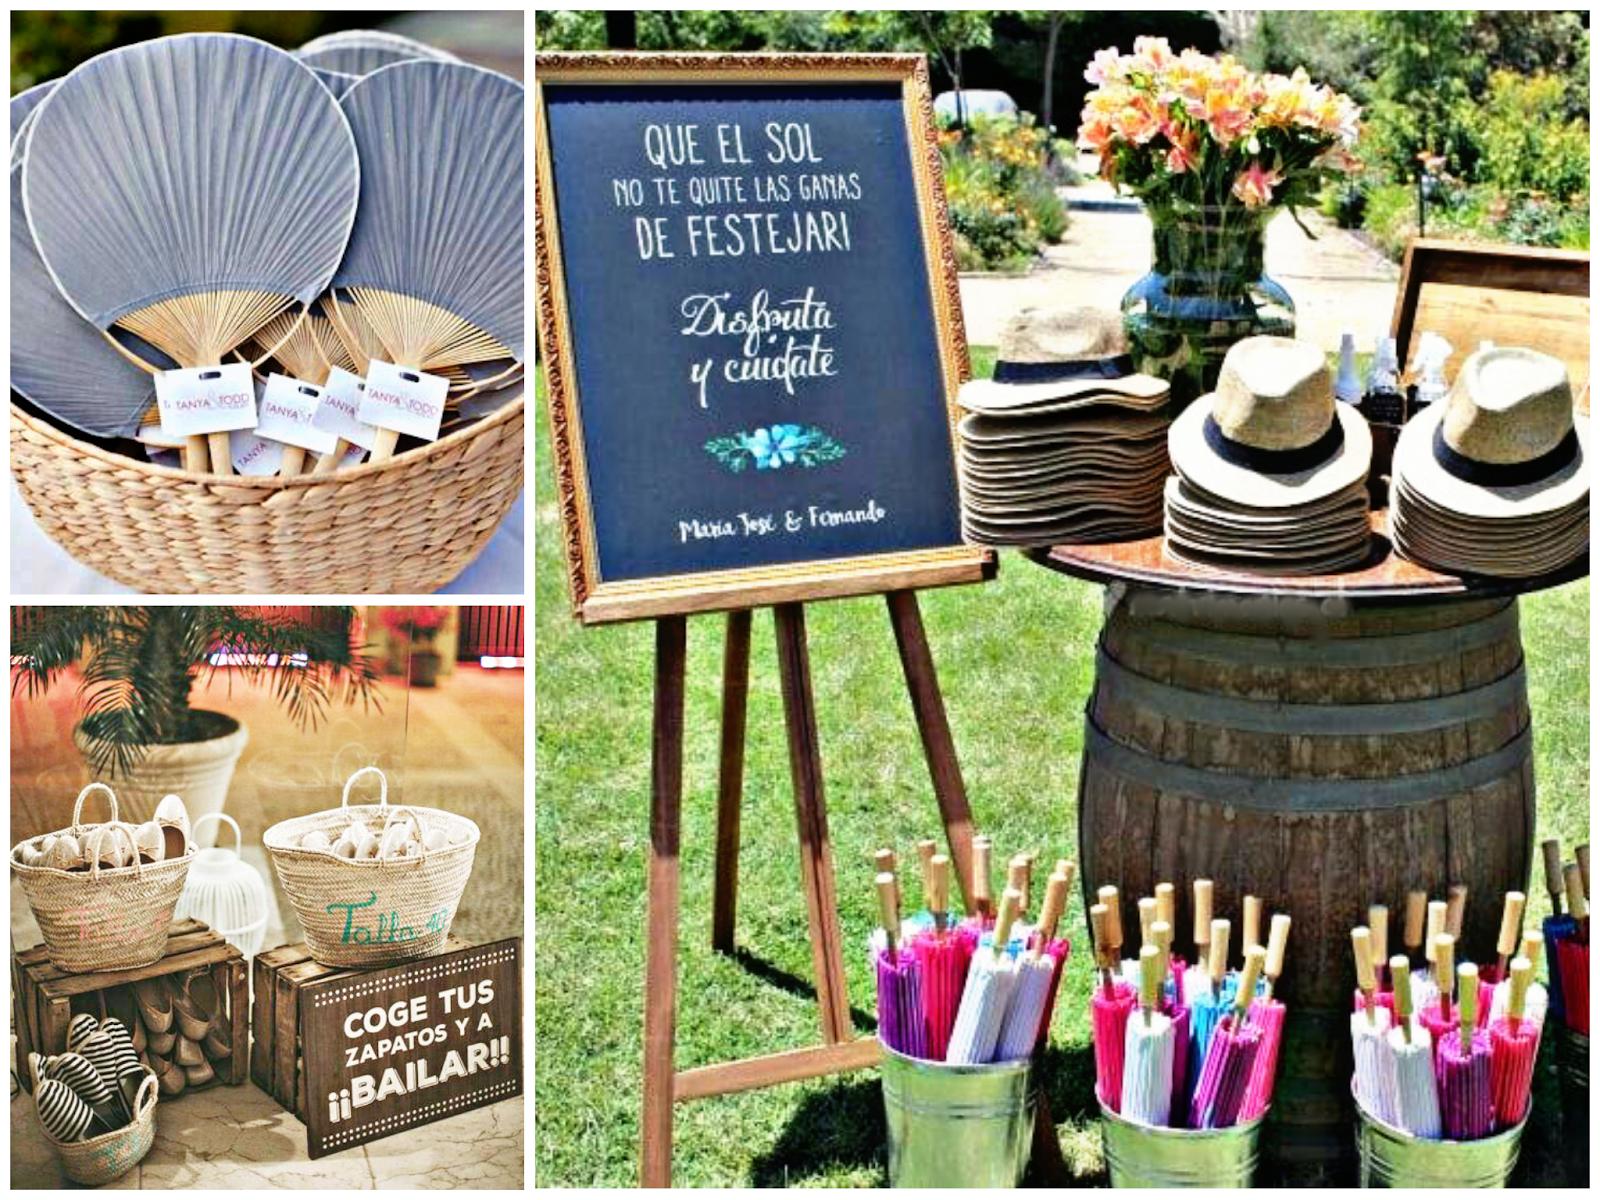 Detalles de boda campestres o molonas para invitados